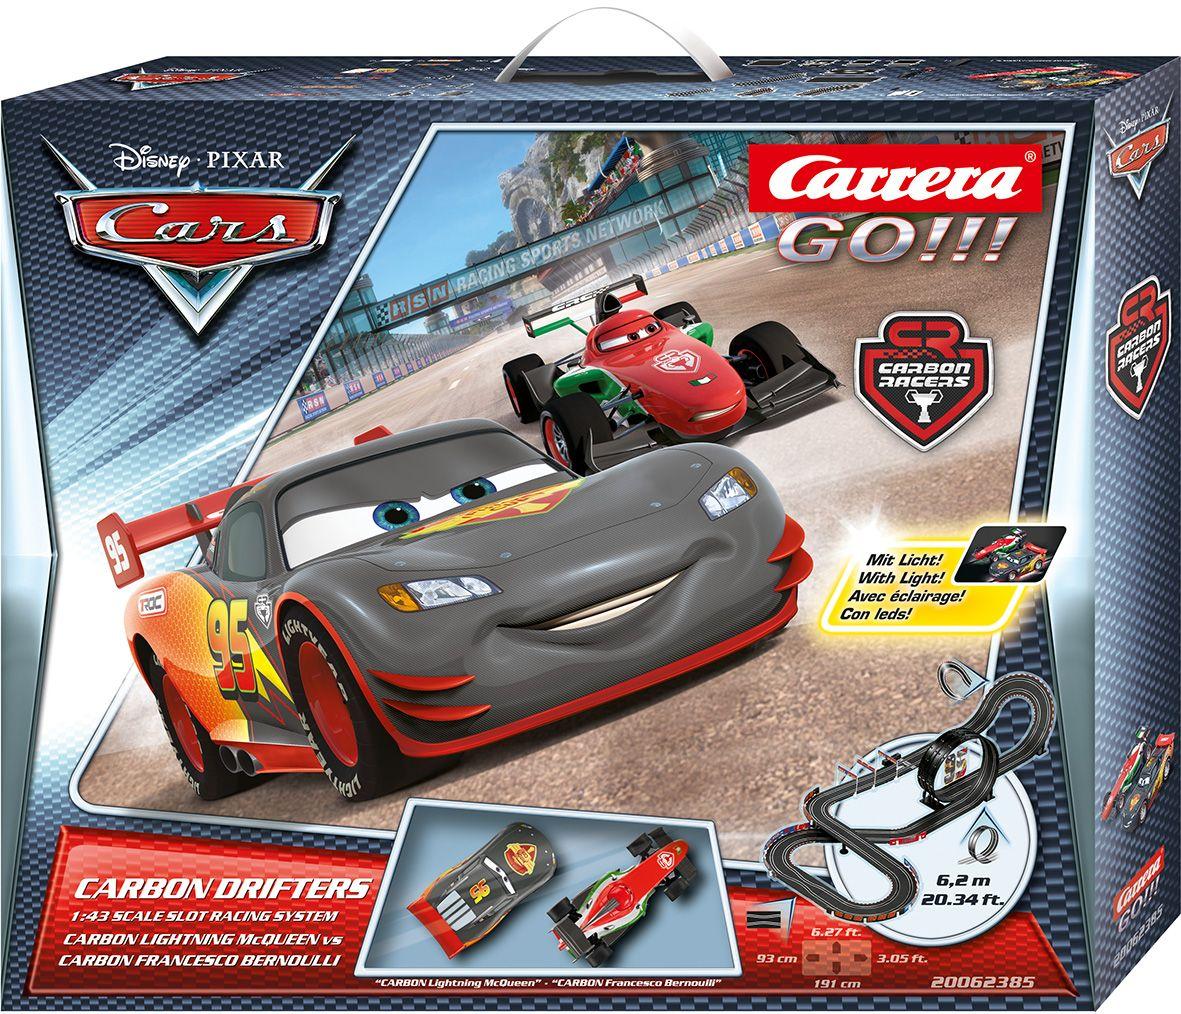 CARRERA Carrera Autorennbahn, »Carrera® GO!!! Disney/Pixar, Carbon Drifters«